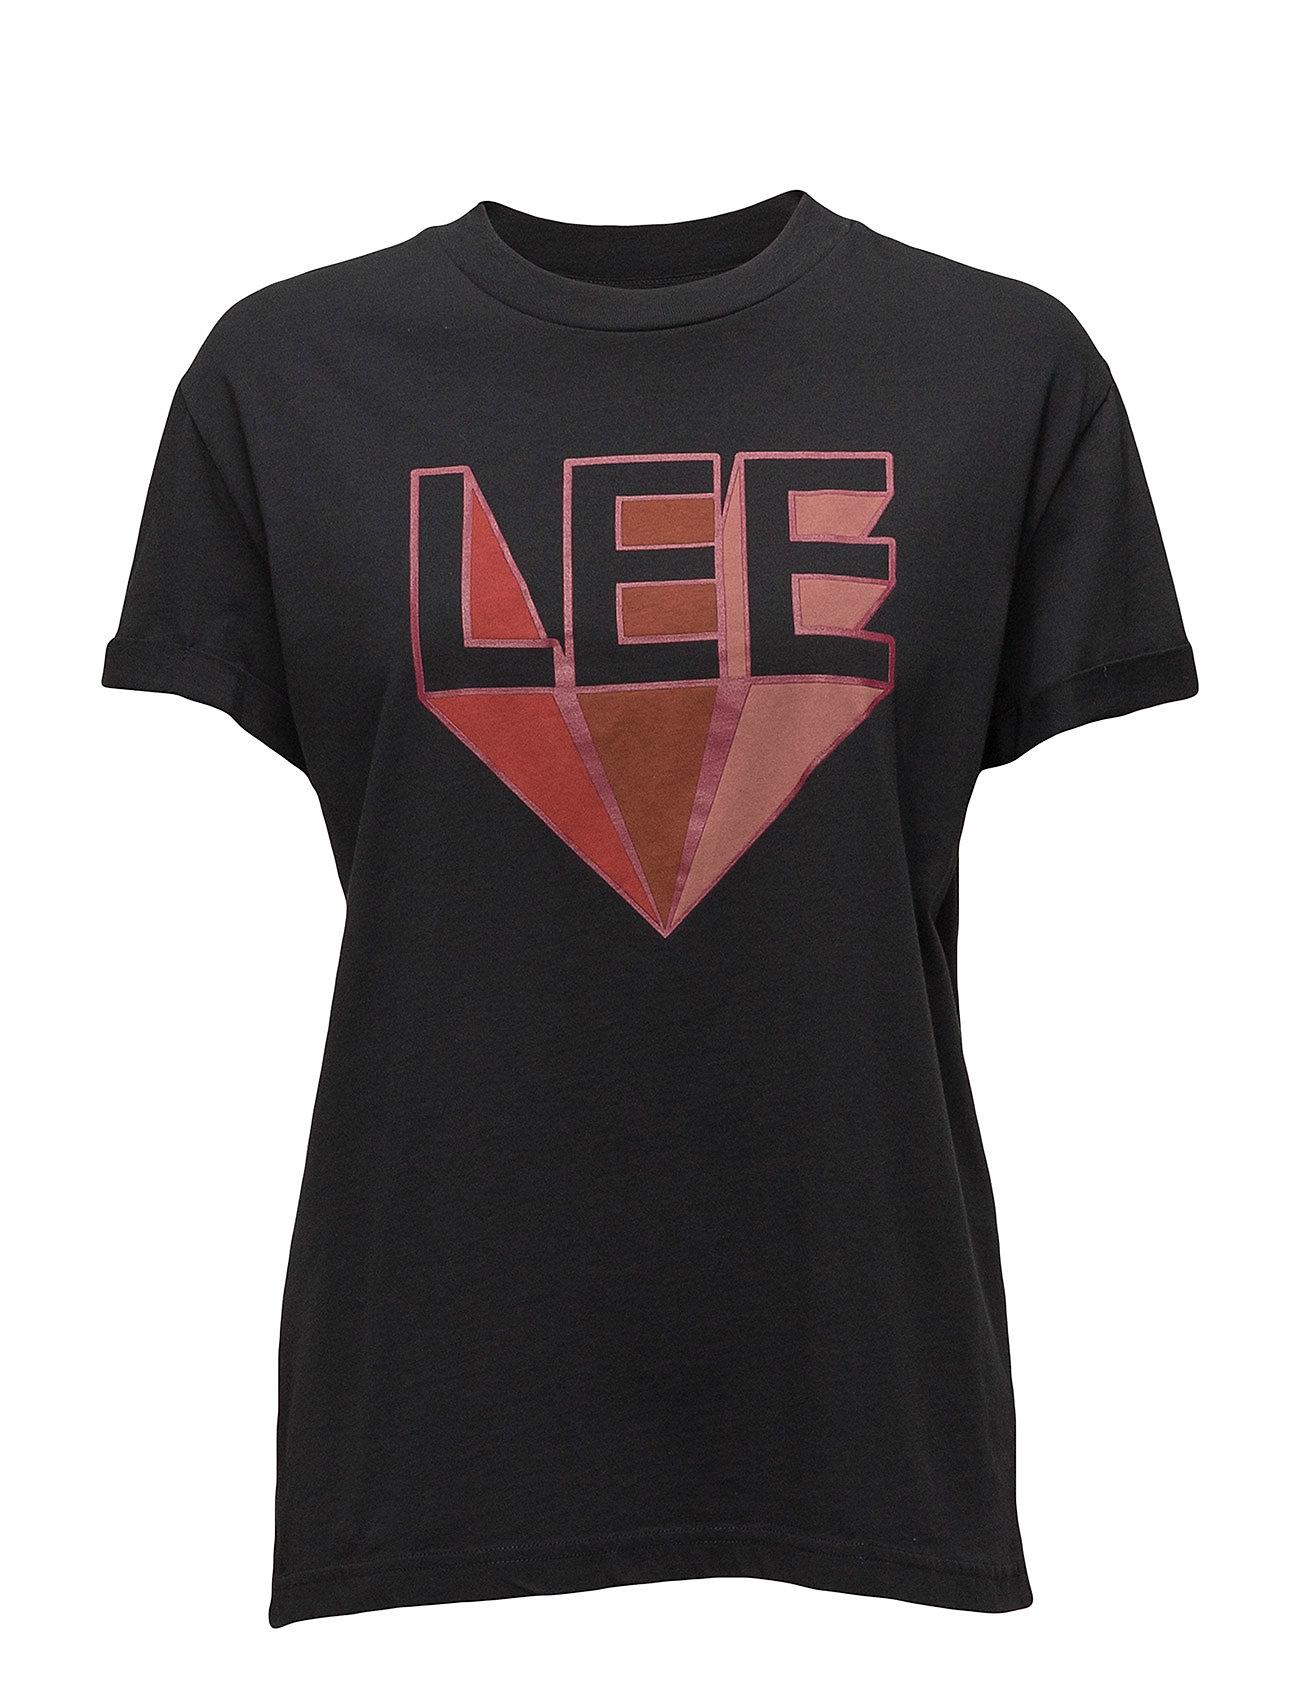 Lee Jeans RETRO LOGO T - FADED BLACK